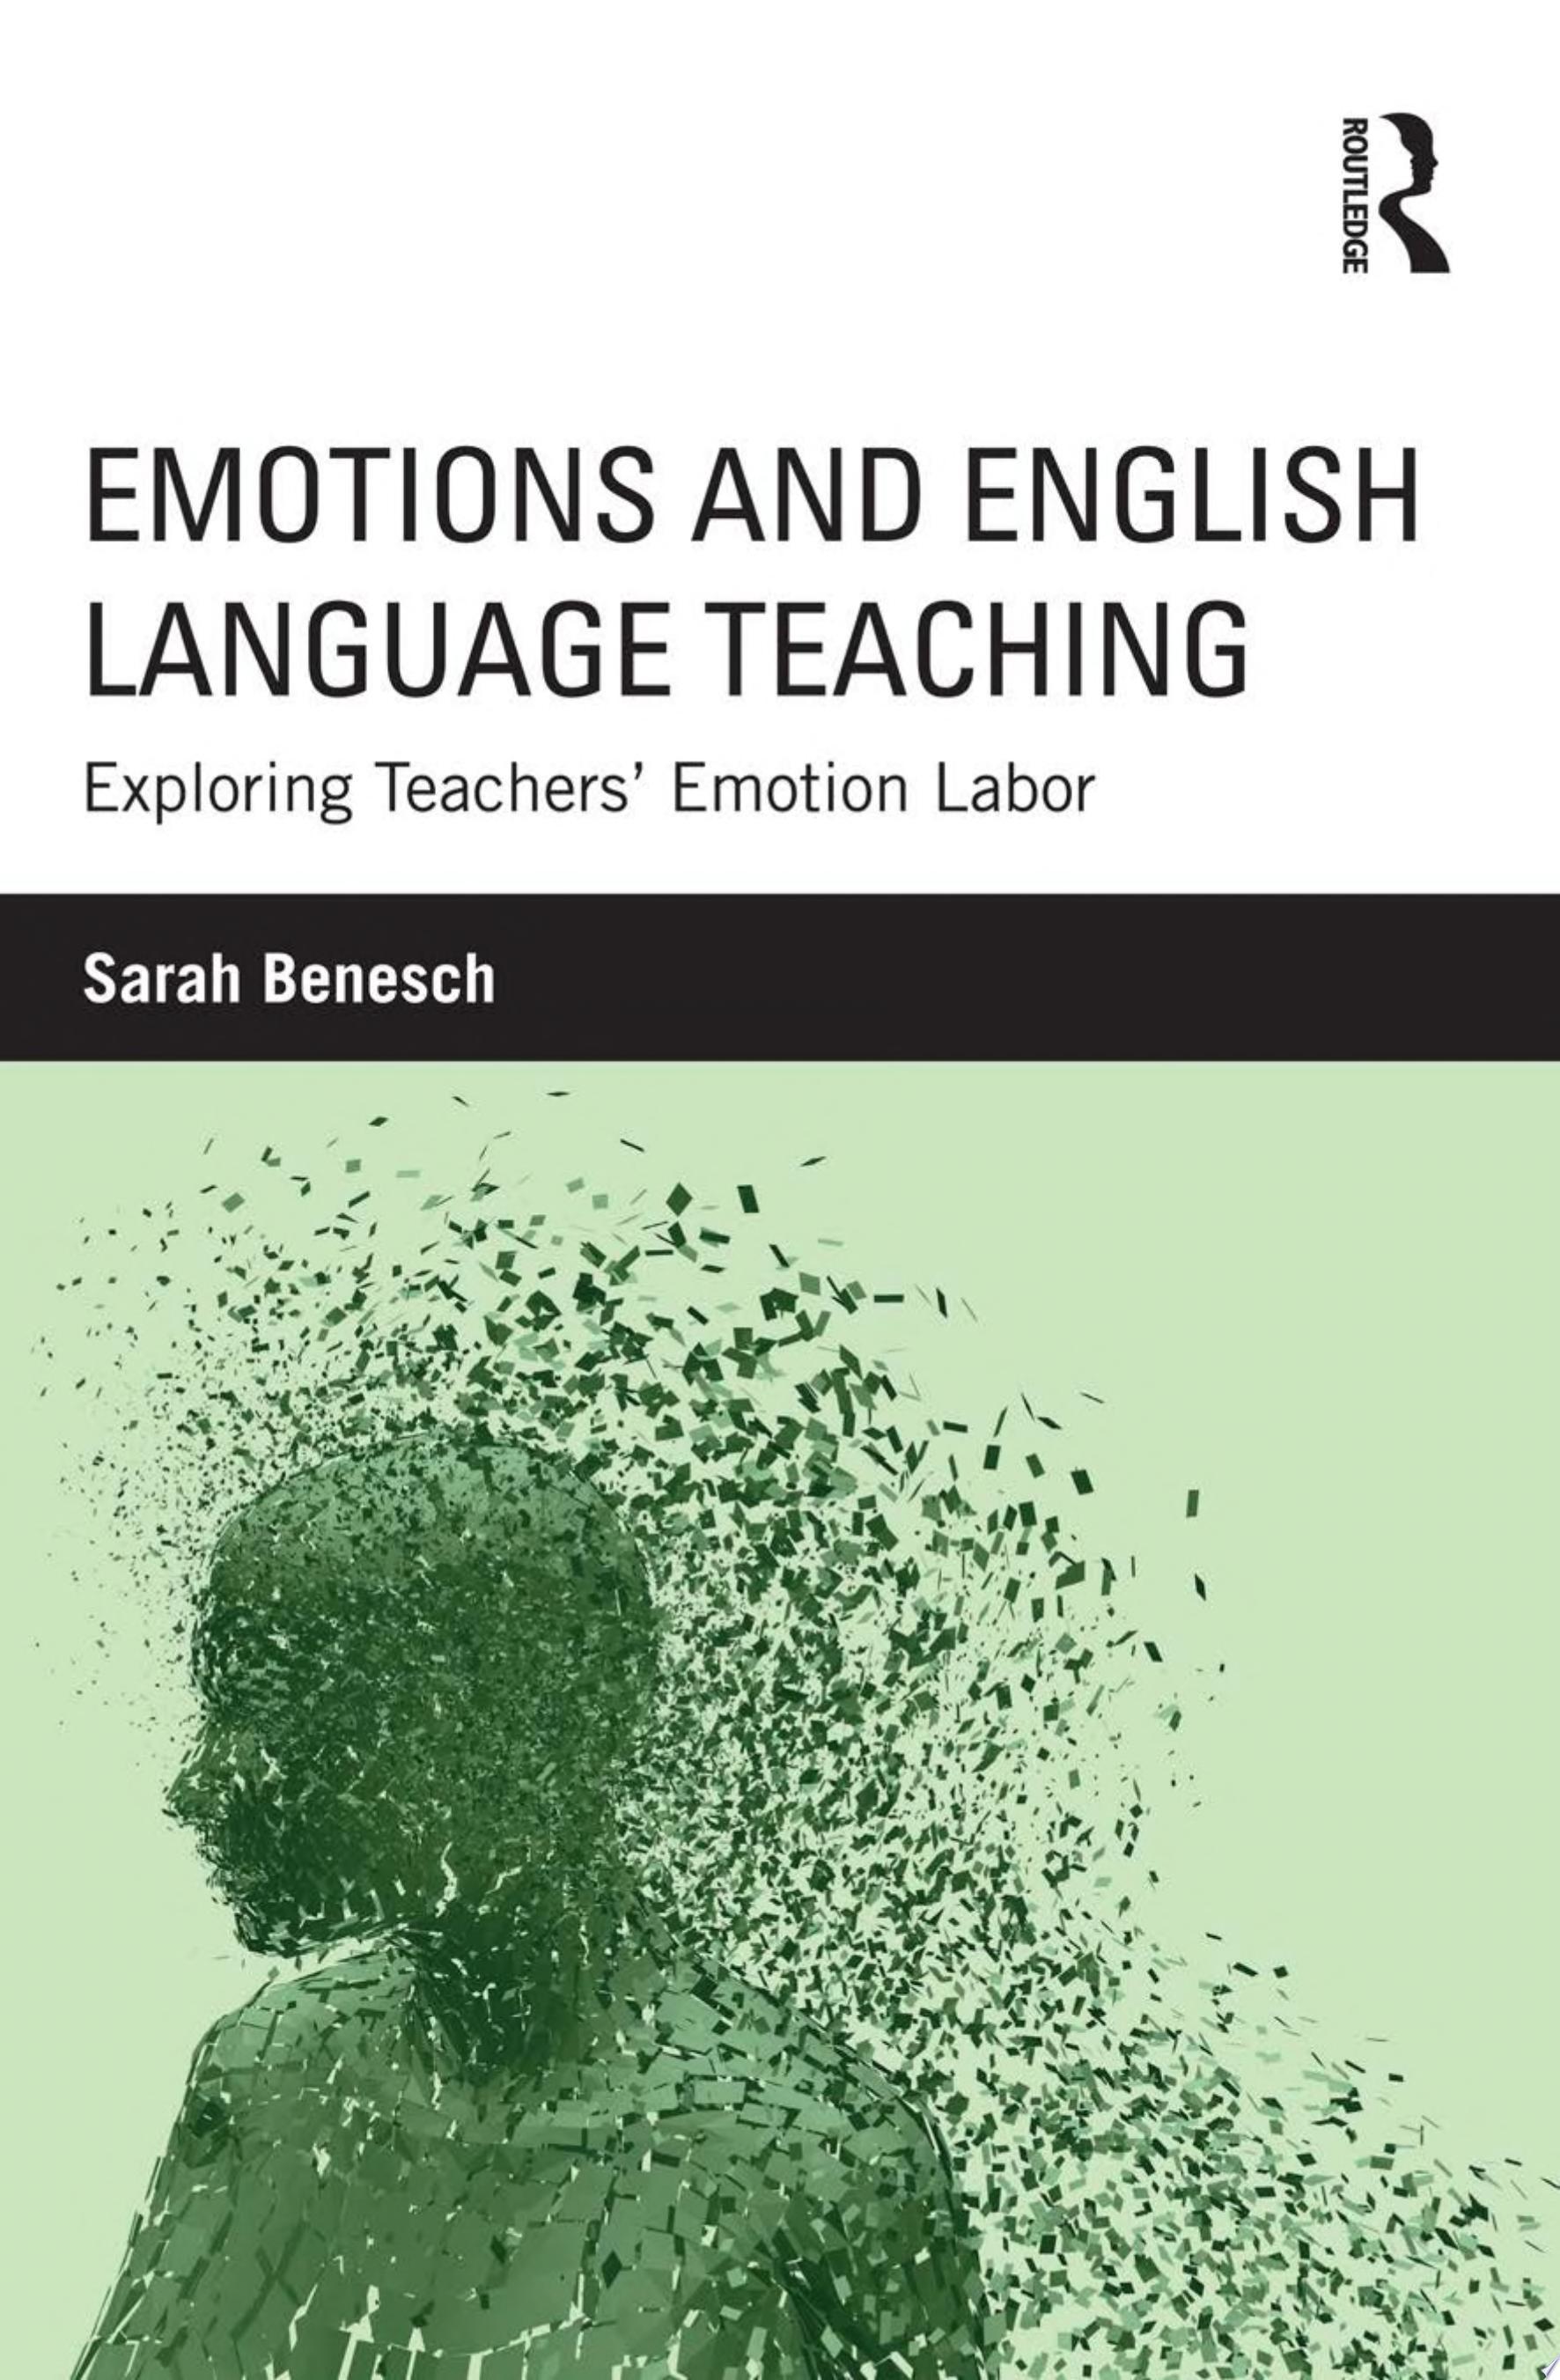 Emotions and English Language Teaching